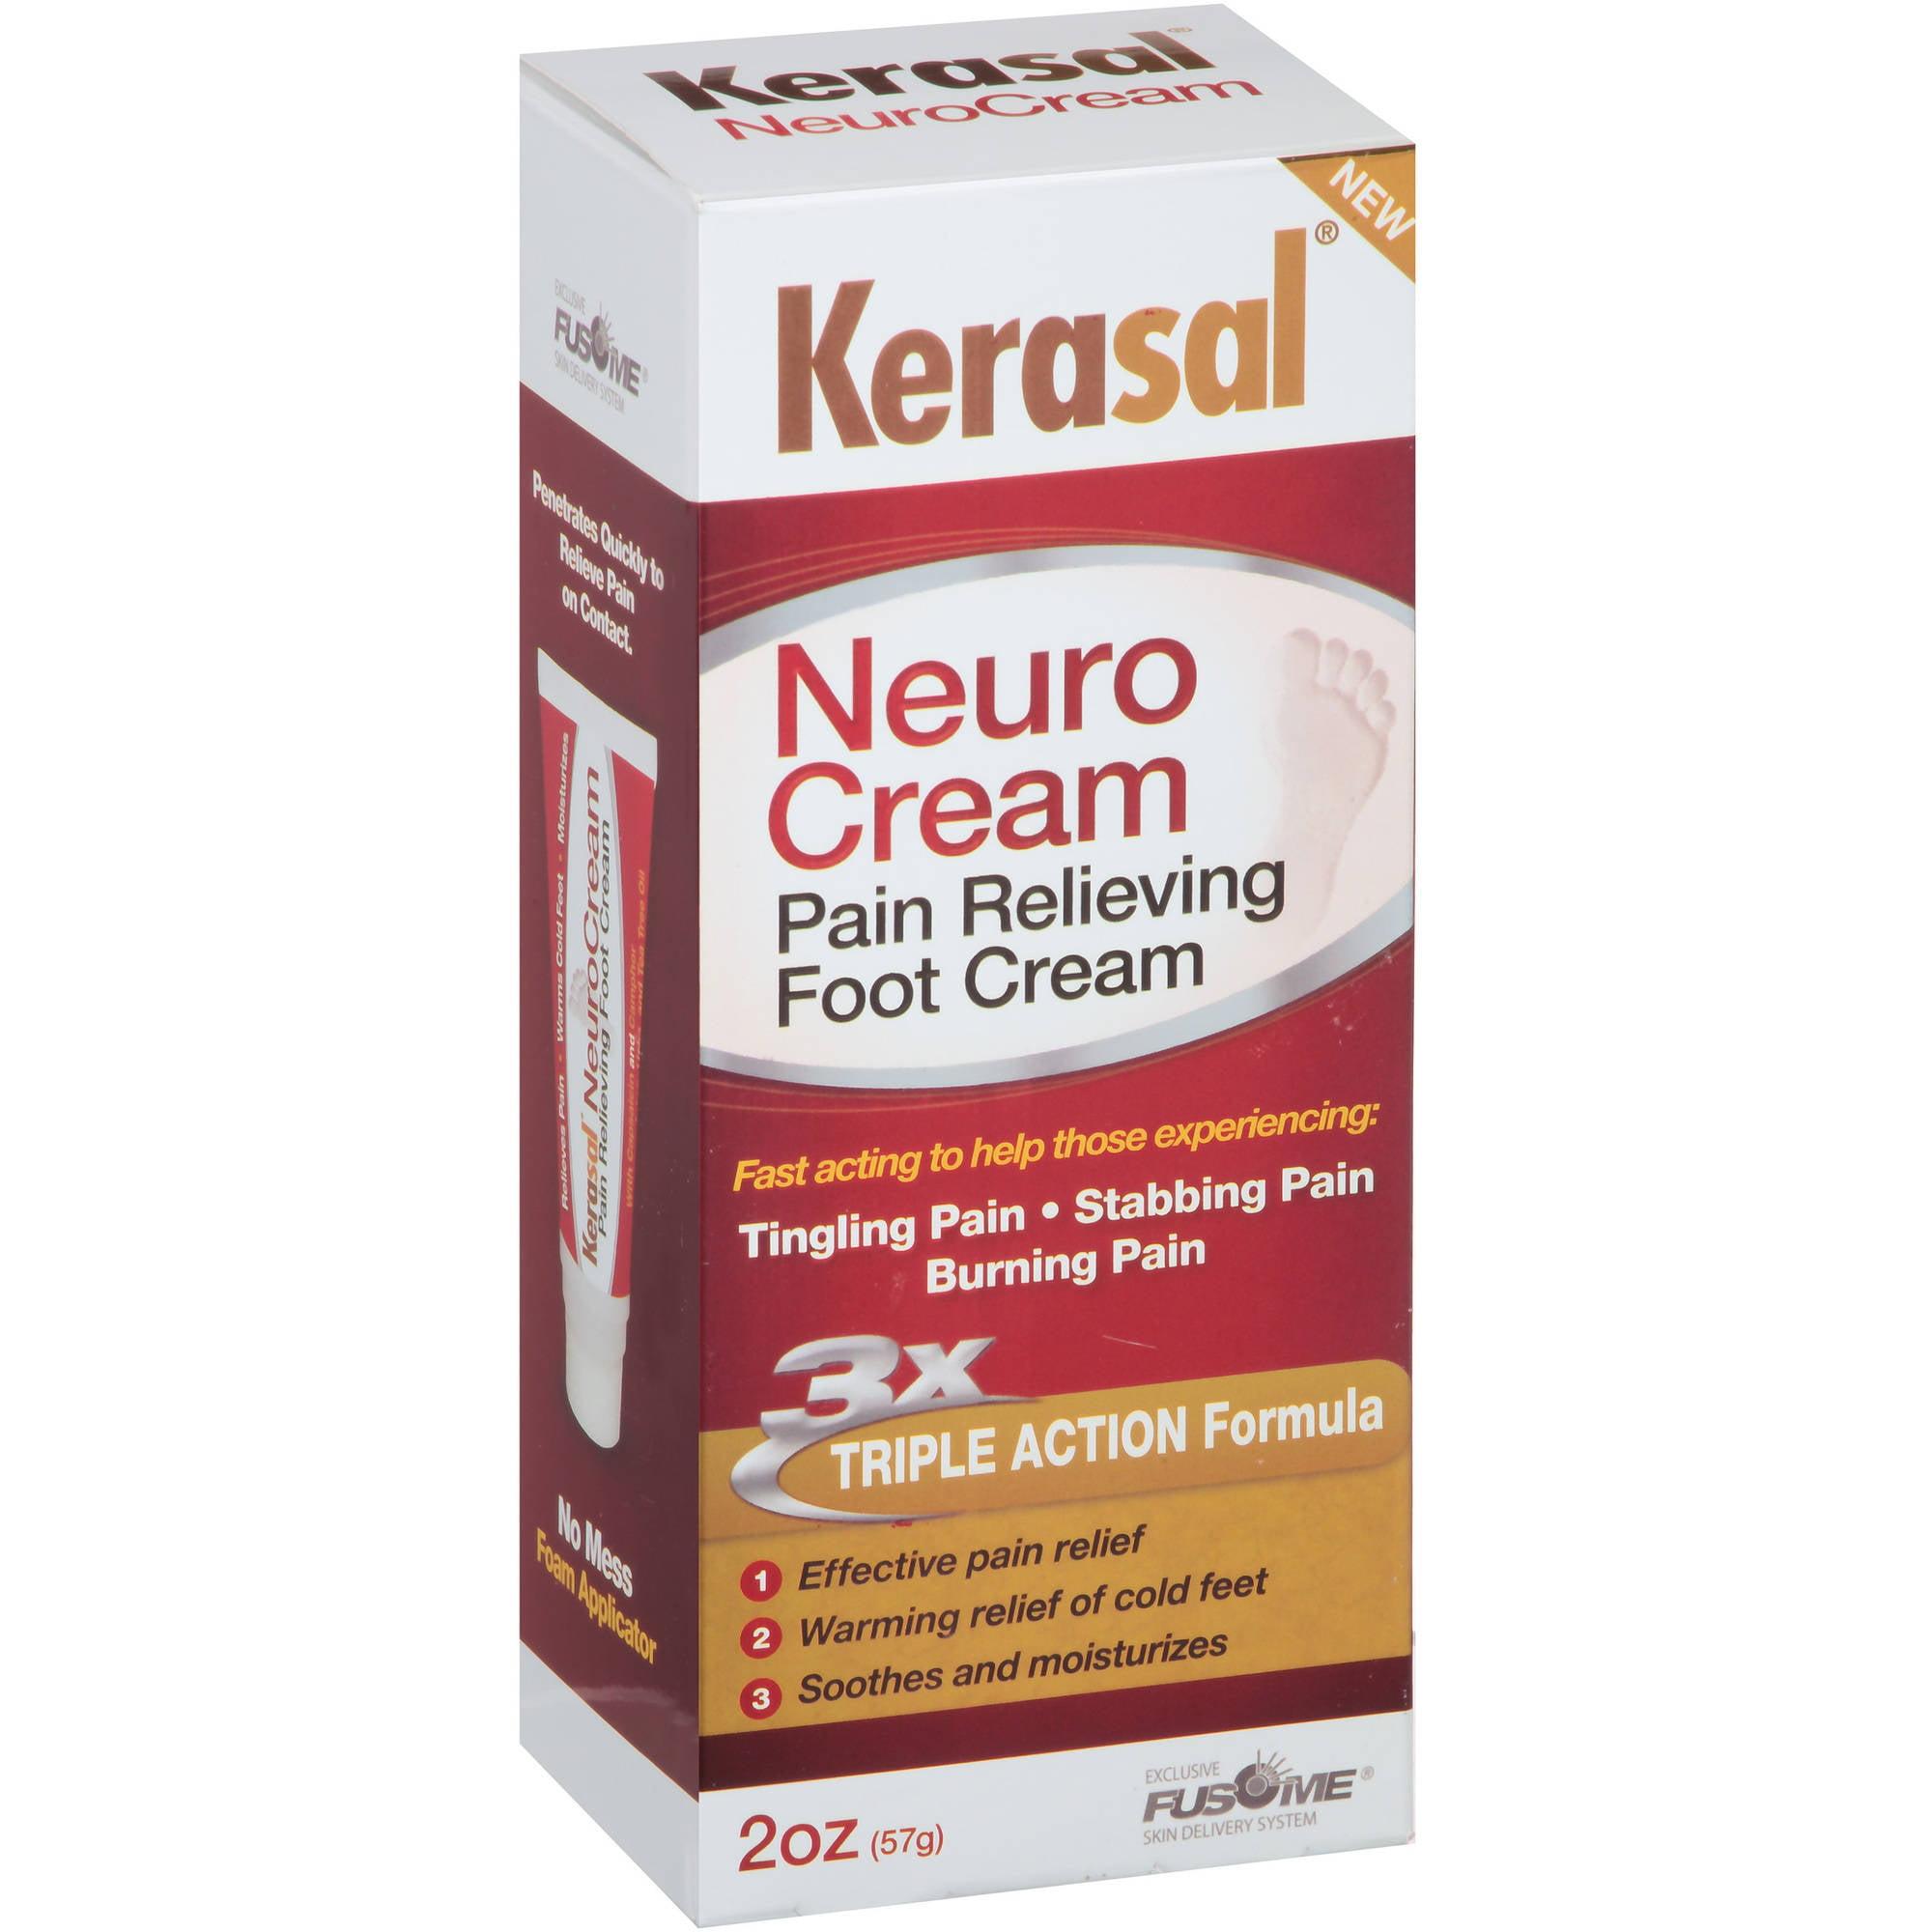 Kerasal Neuro Cream Pain Relieving Foot Cream, 2 oz - Walmart.com